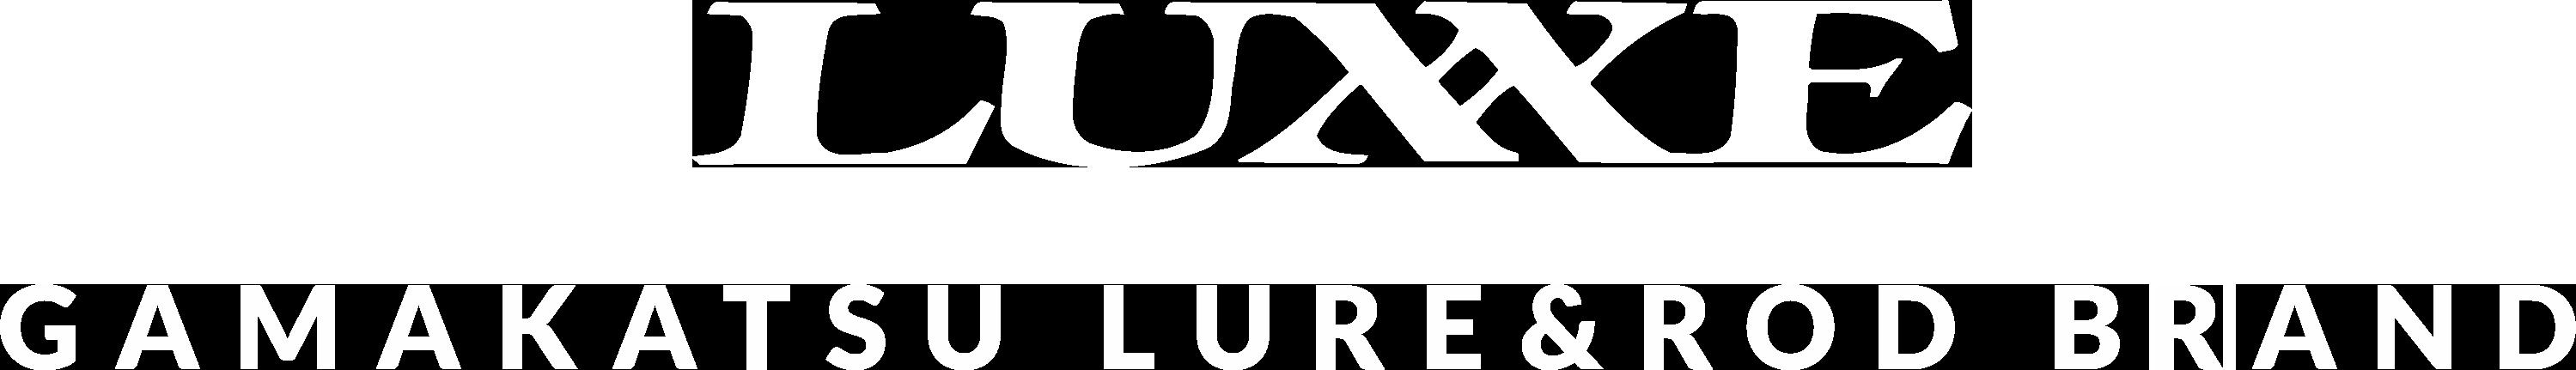 LUXXE GAMAKATSU LURE & ROD BRAND